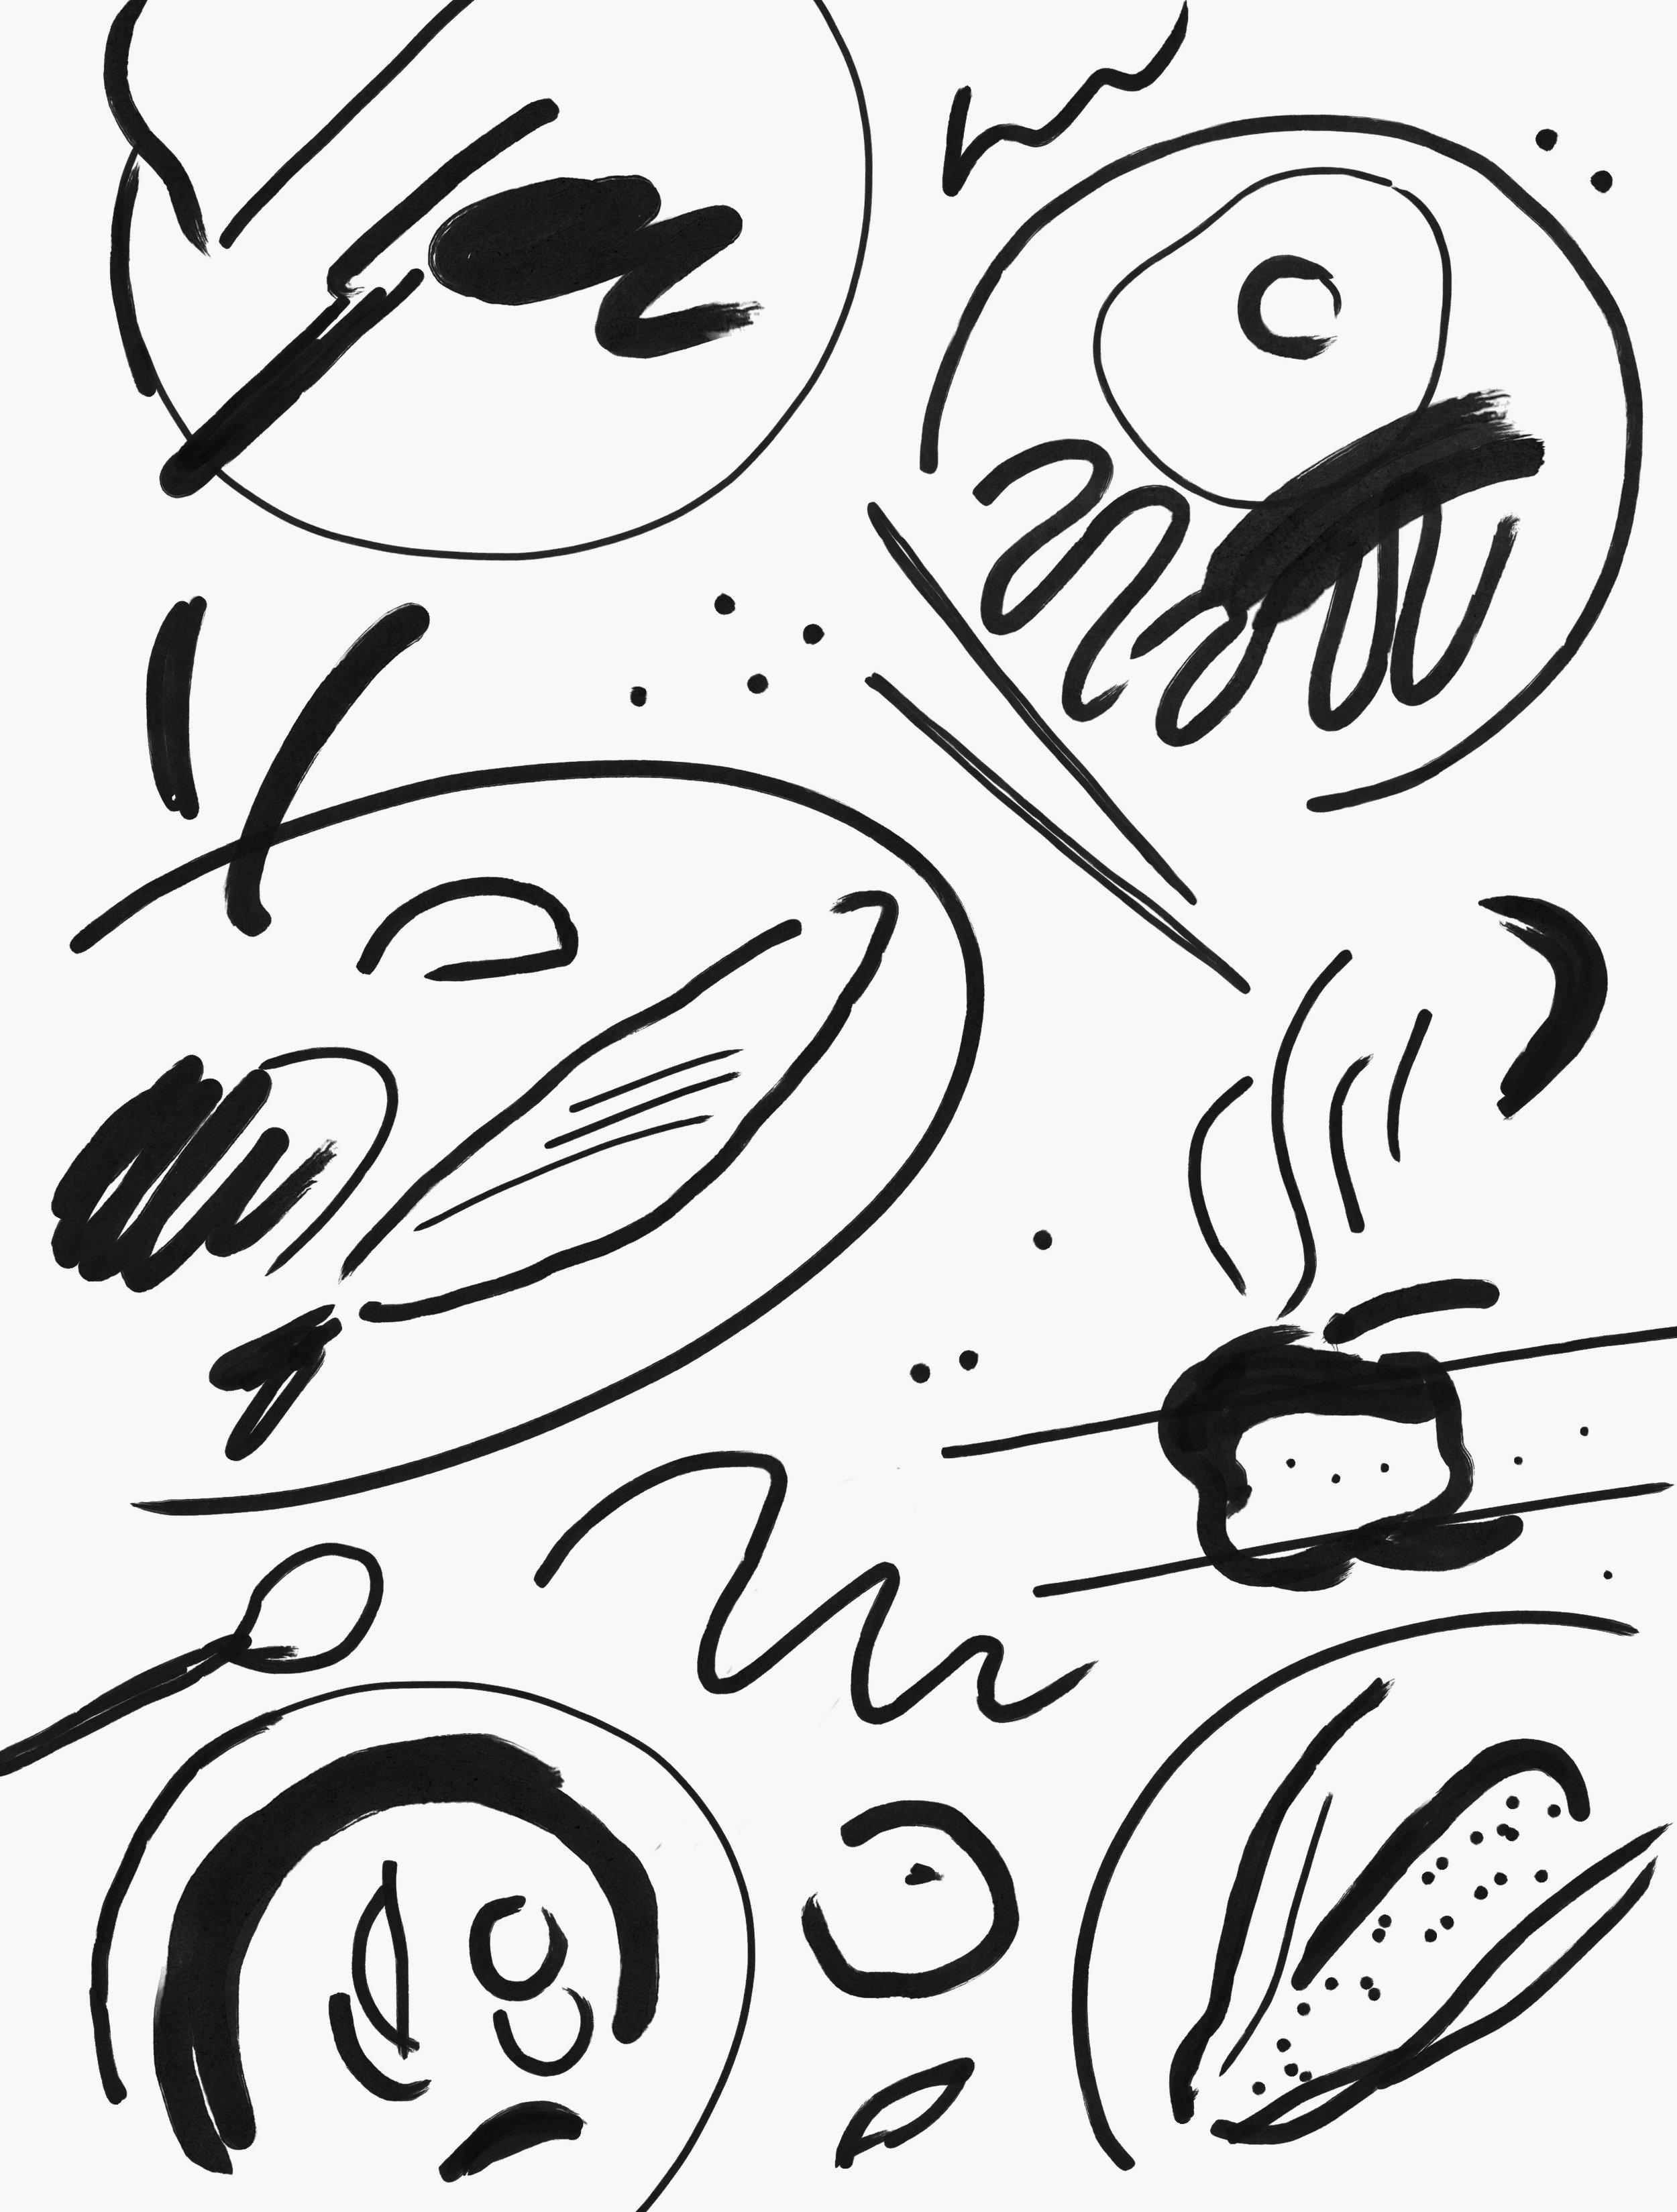 brummell_sketch1.jpg